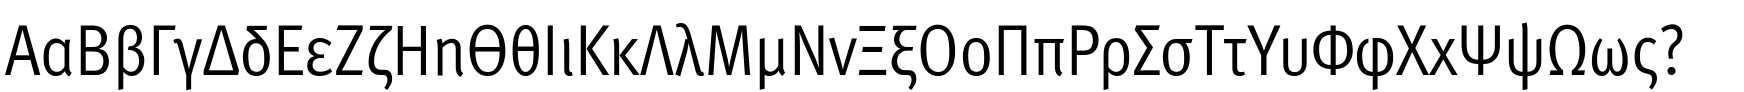 MetaOffcPro-CondNormal.ttf